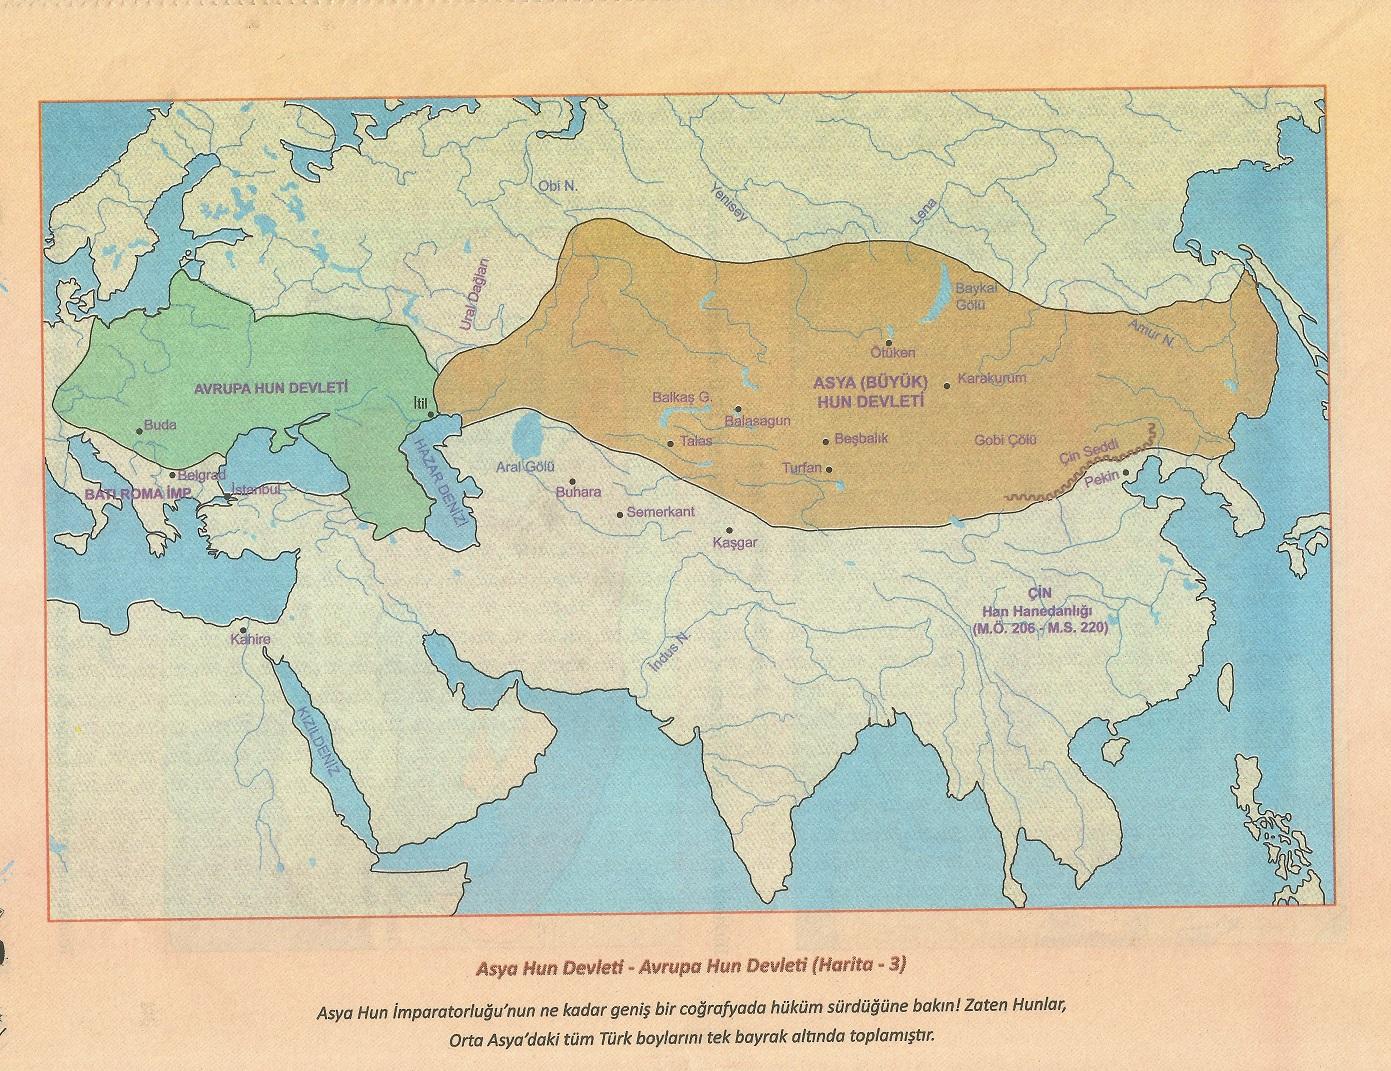 Avrupa Hun Devleti (375-469)